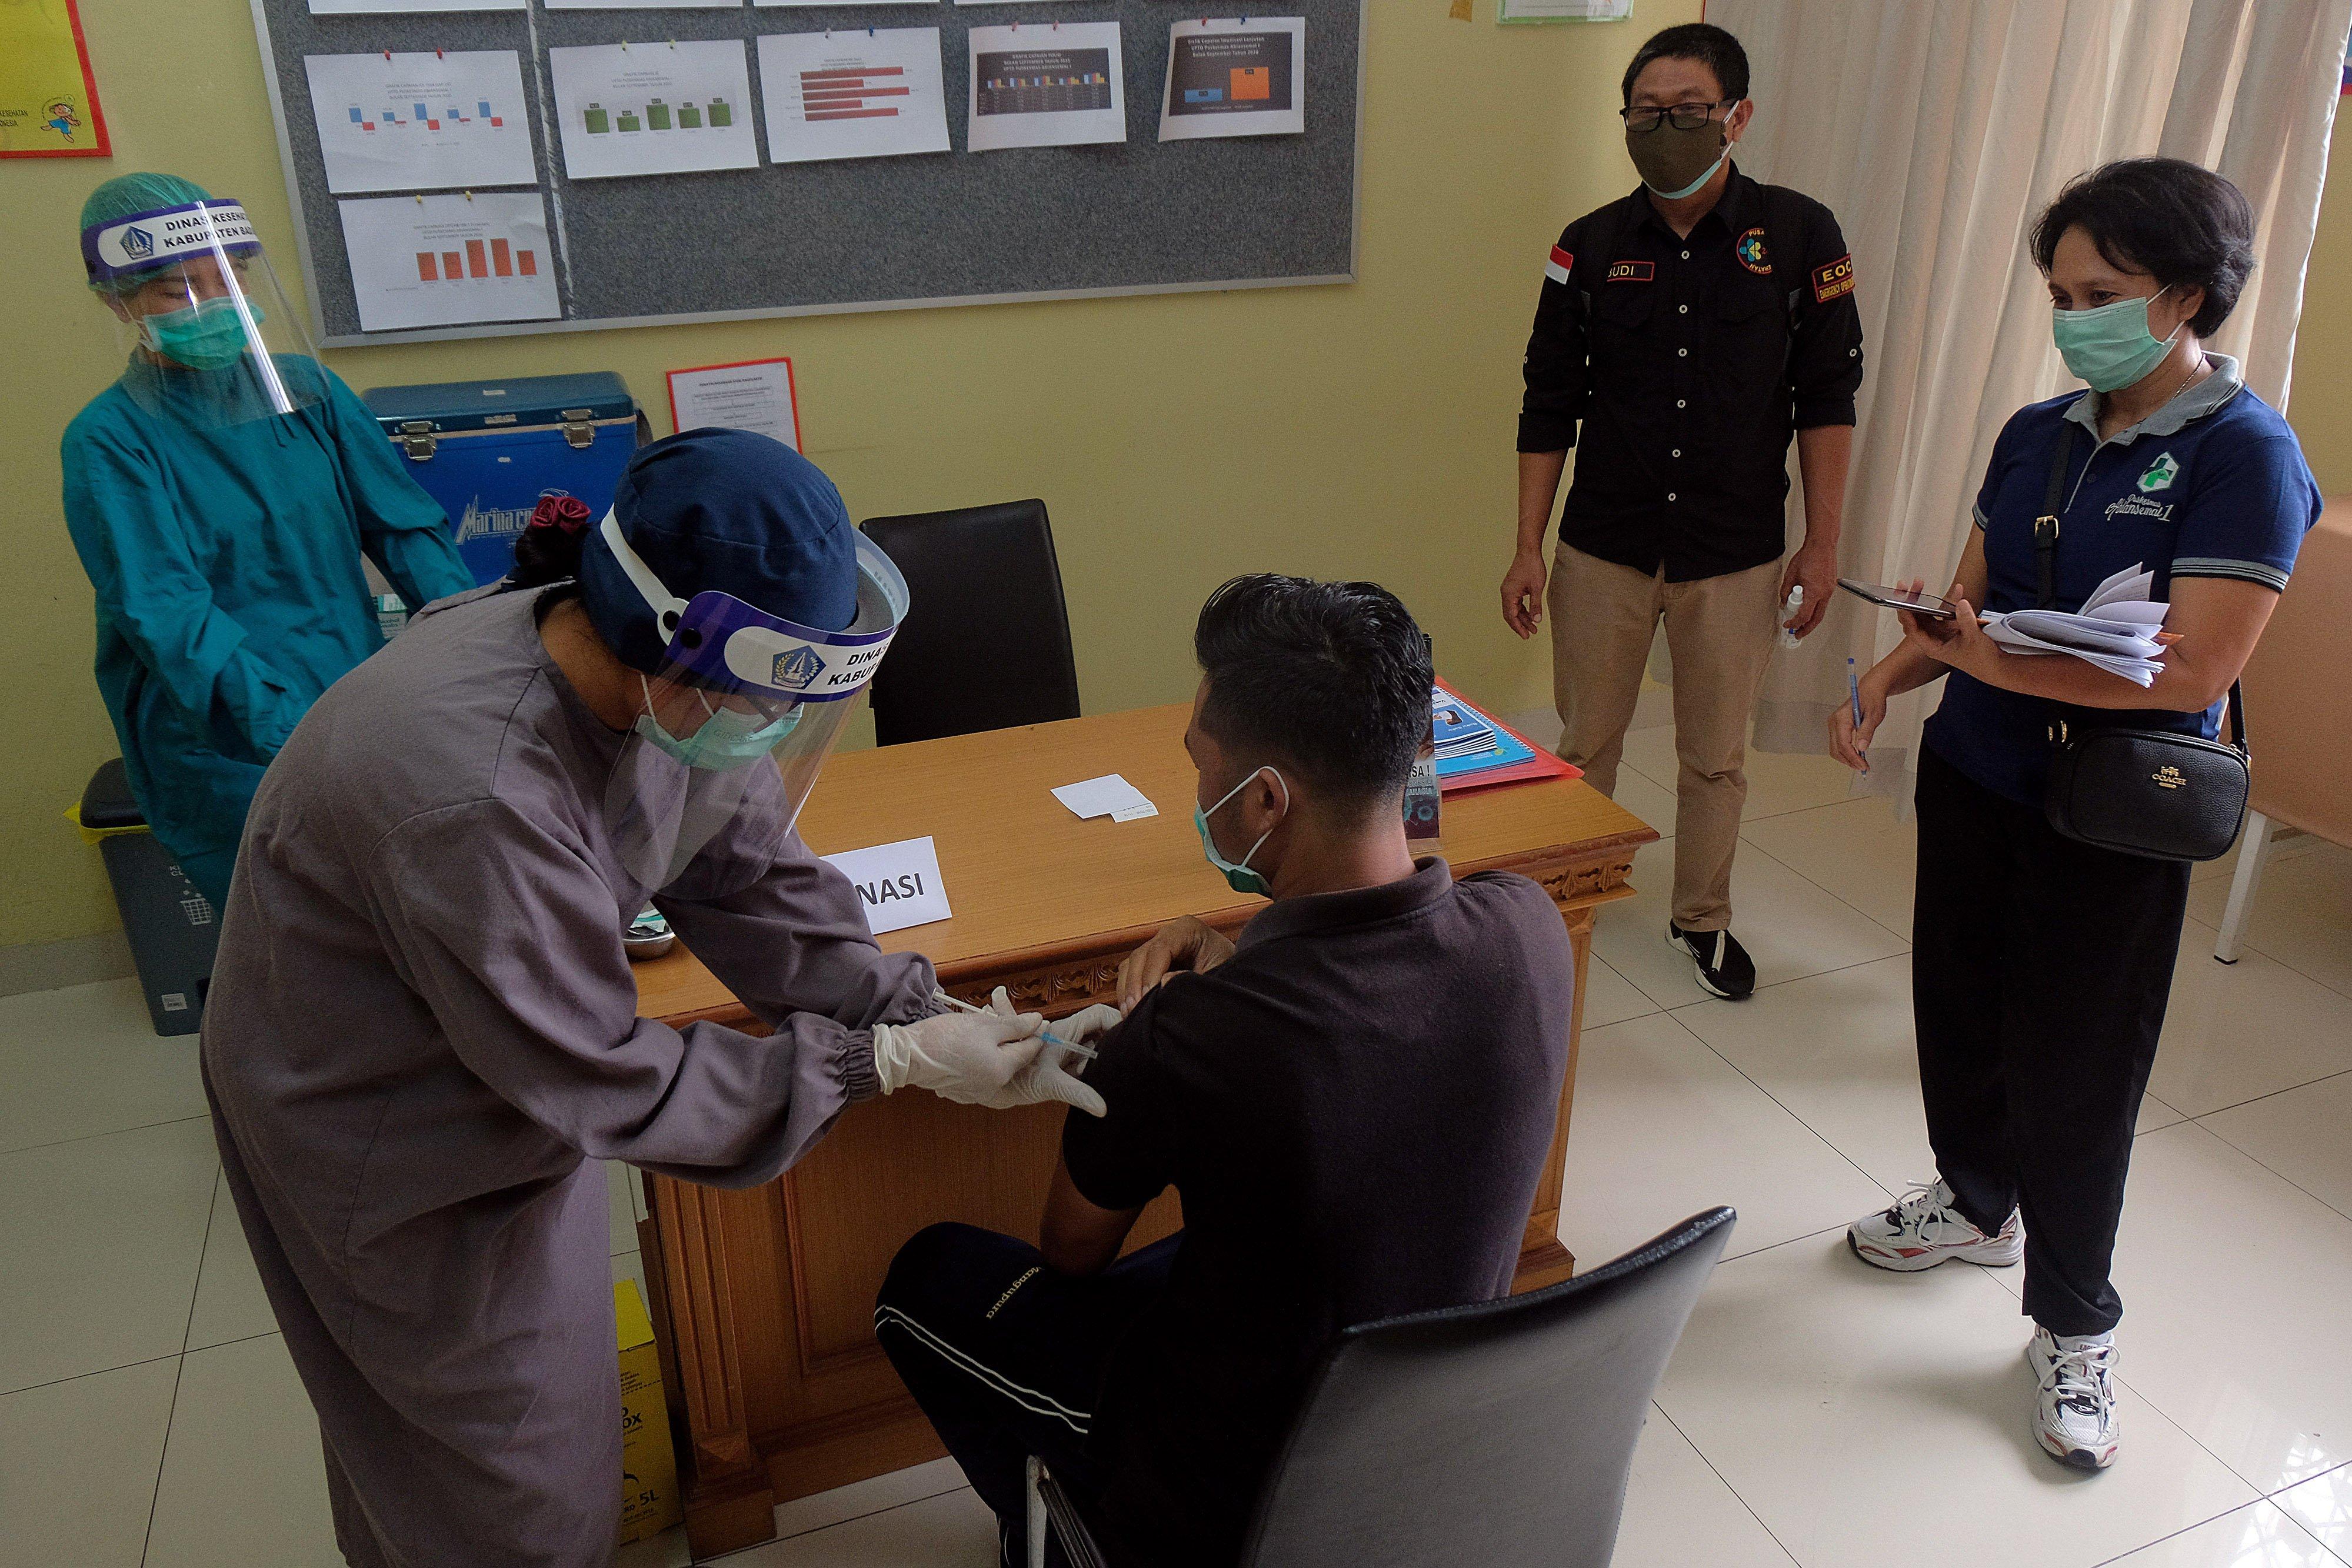 Tim medis melakukan penanganan terhadap pasien dalam persiapan simulasi vaksinasi COVID-19 di Puskesmas Abiansemal I, Badung, Bali, Senin (5/10/2020). Kementerian Kesehatan melakukan kunjungan dan survei untuk melihat kesiapan puskesmas tersebut sebagai lokasi layanan vaksinasi COVID-19 serta menggelar simulasi pada Selasa (6/10).